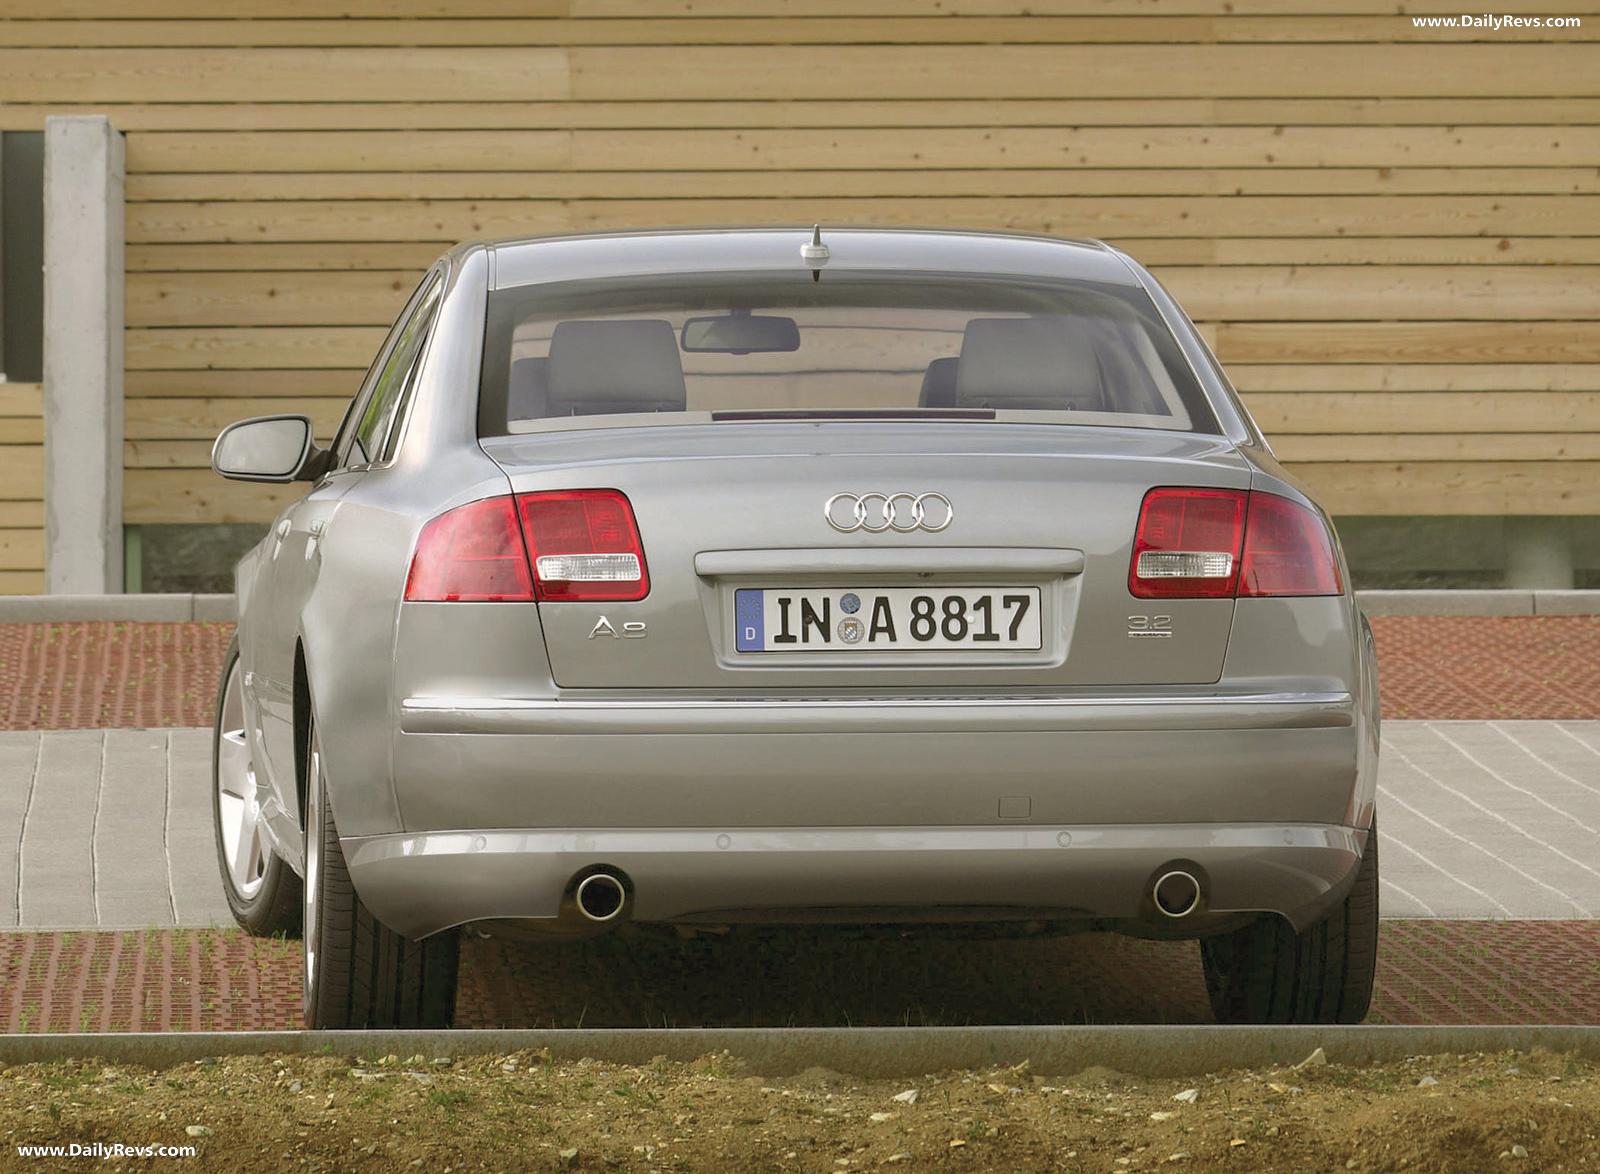 Kelebihan Kekurangan Audi A8 2005 Murah Berkualitas